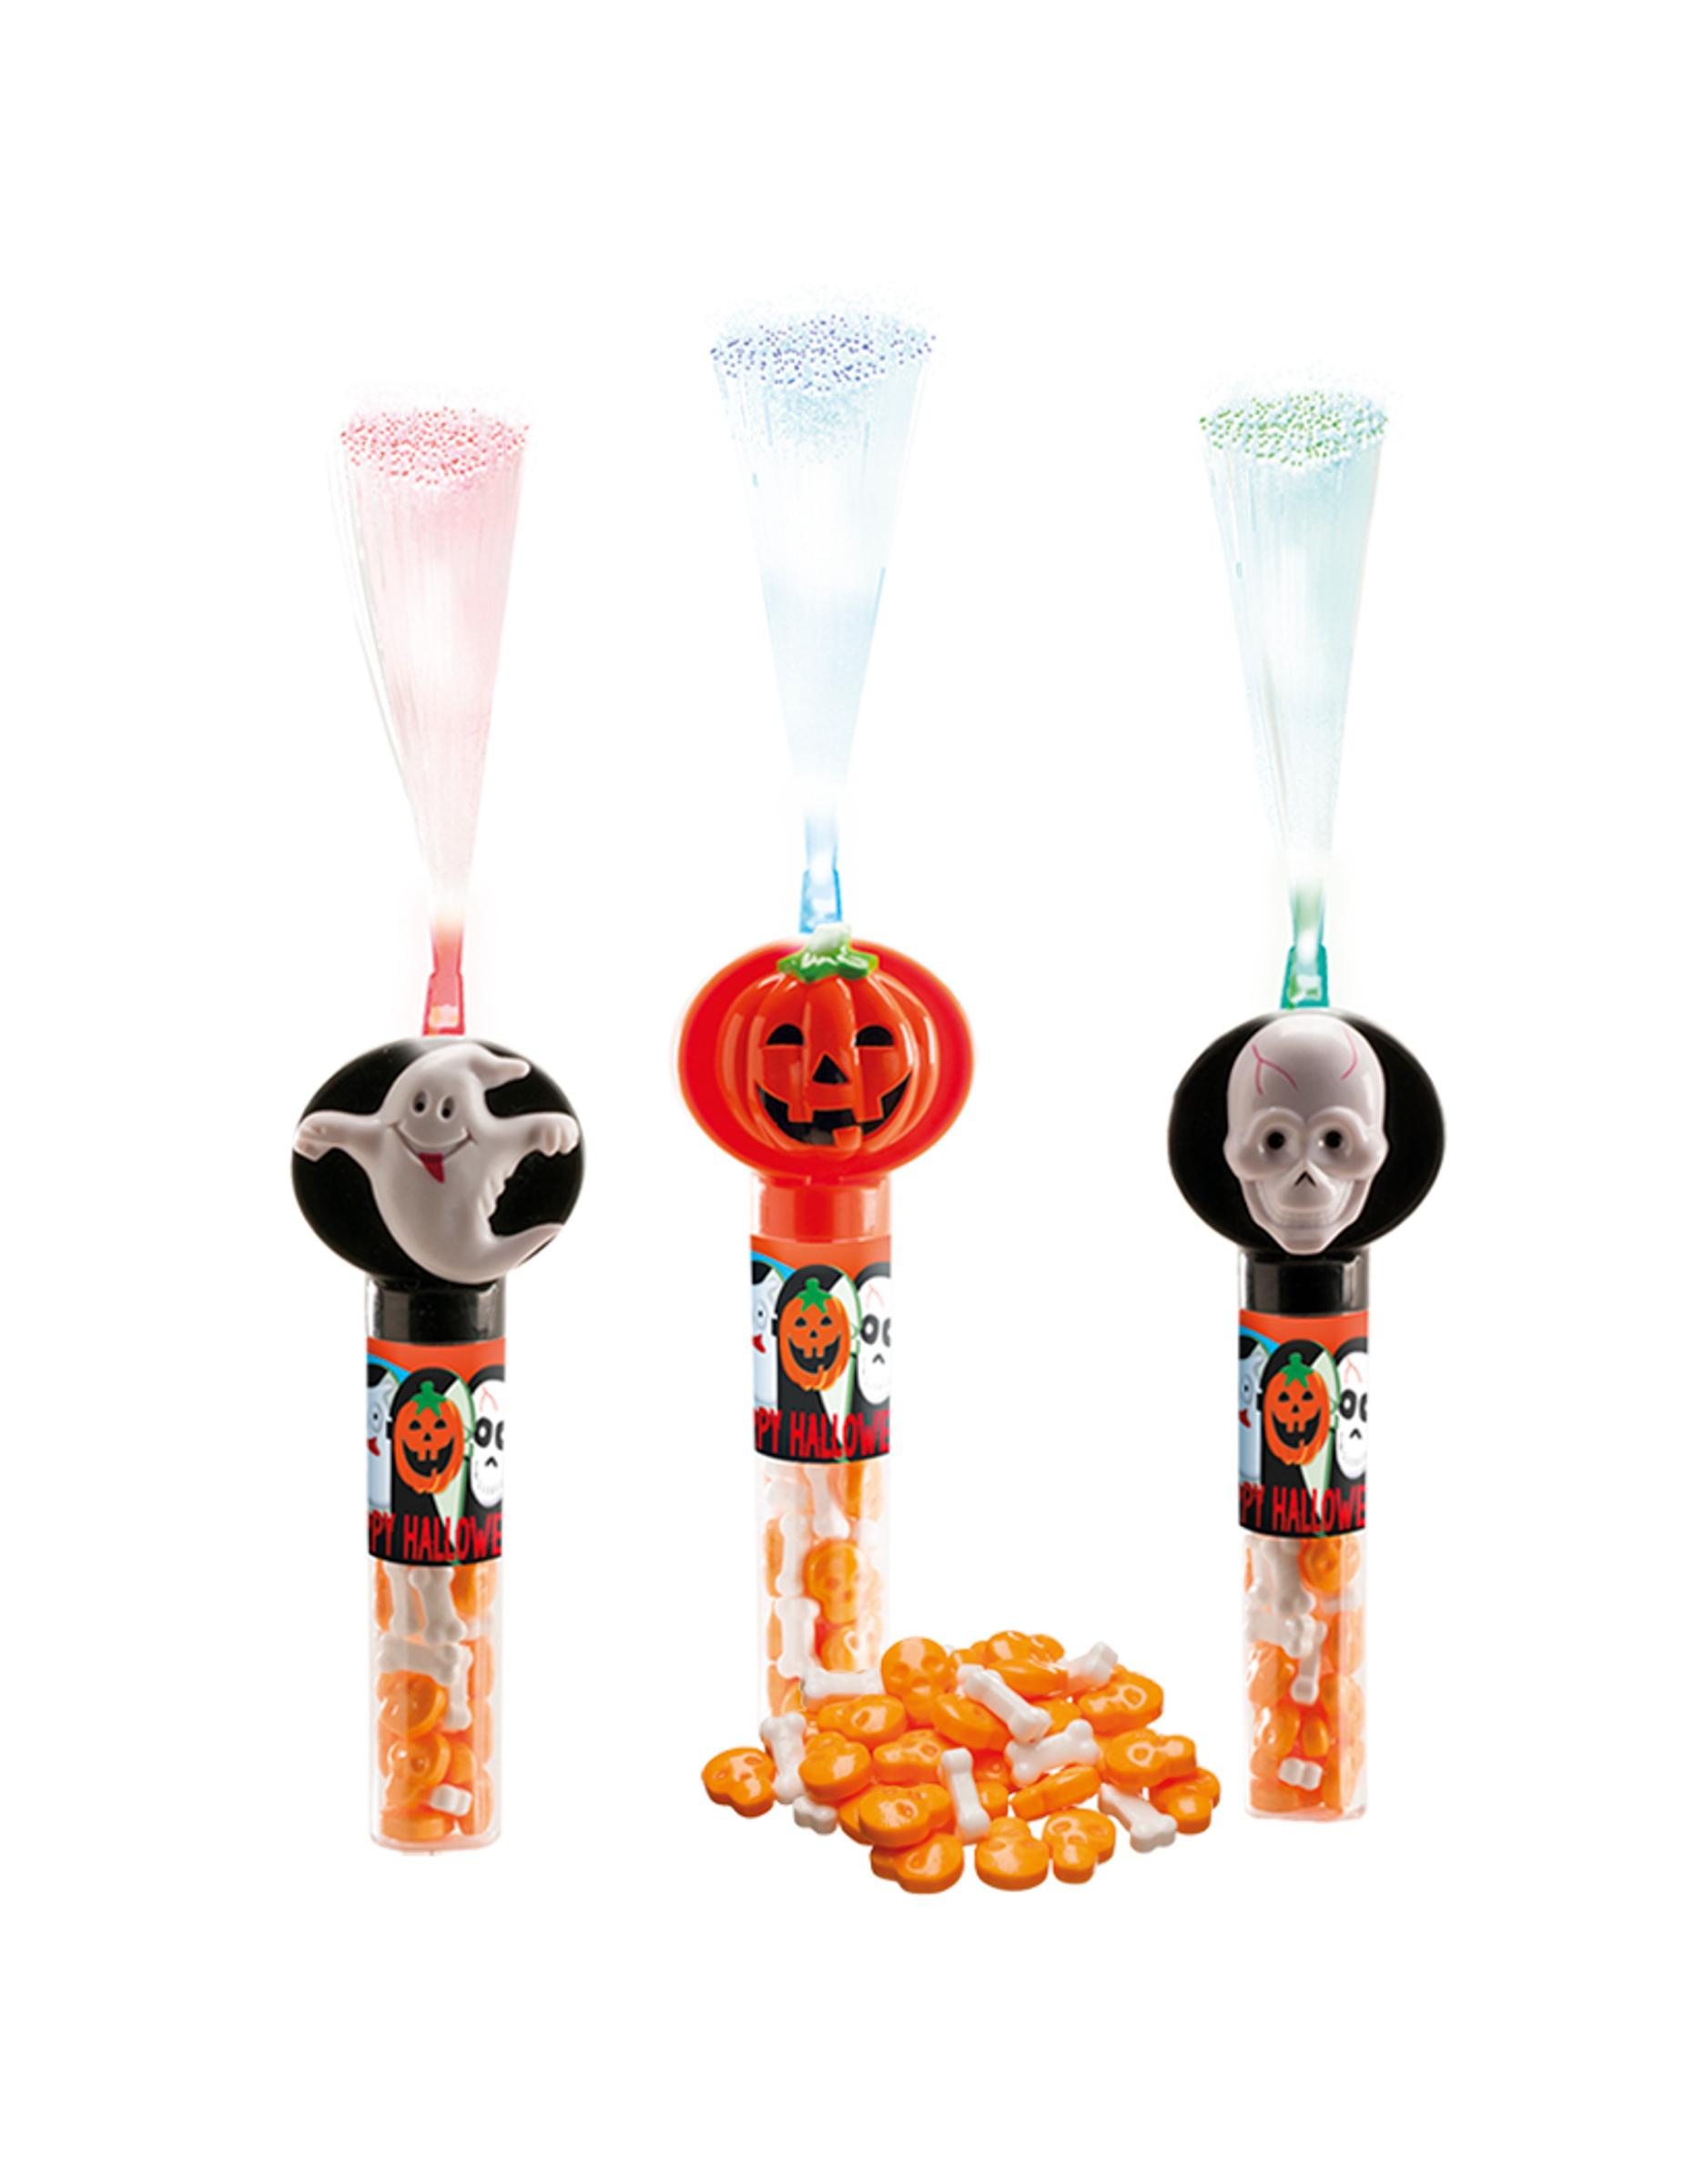 Decoracion halloween barata trendy with decoracion - Decoracion halloween barata ...